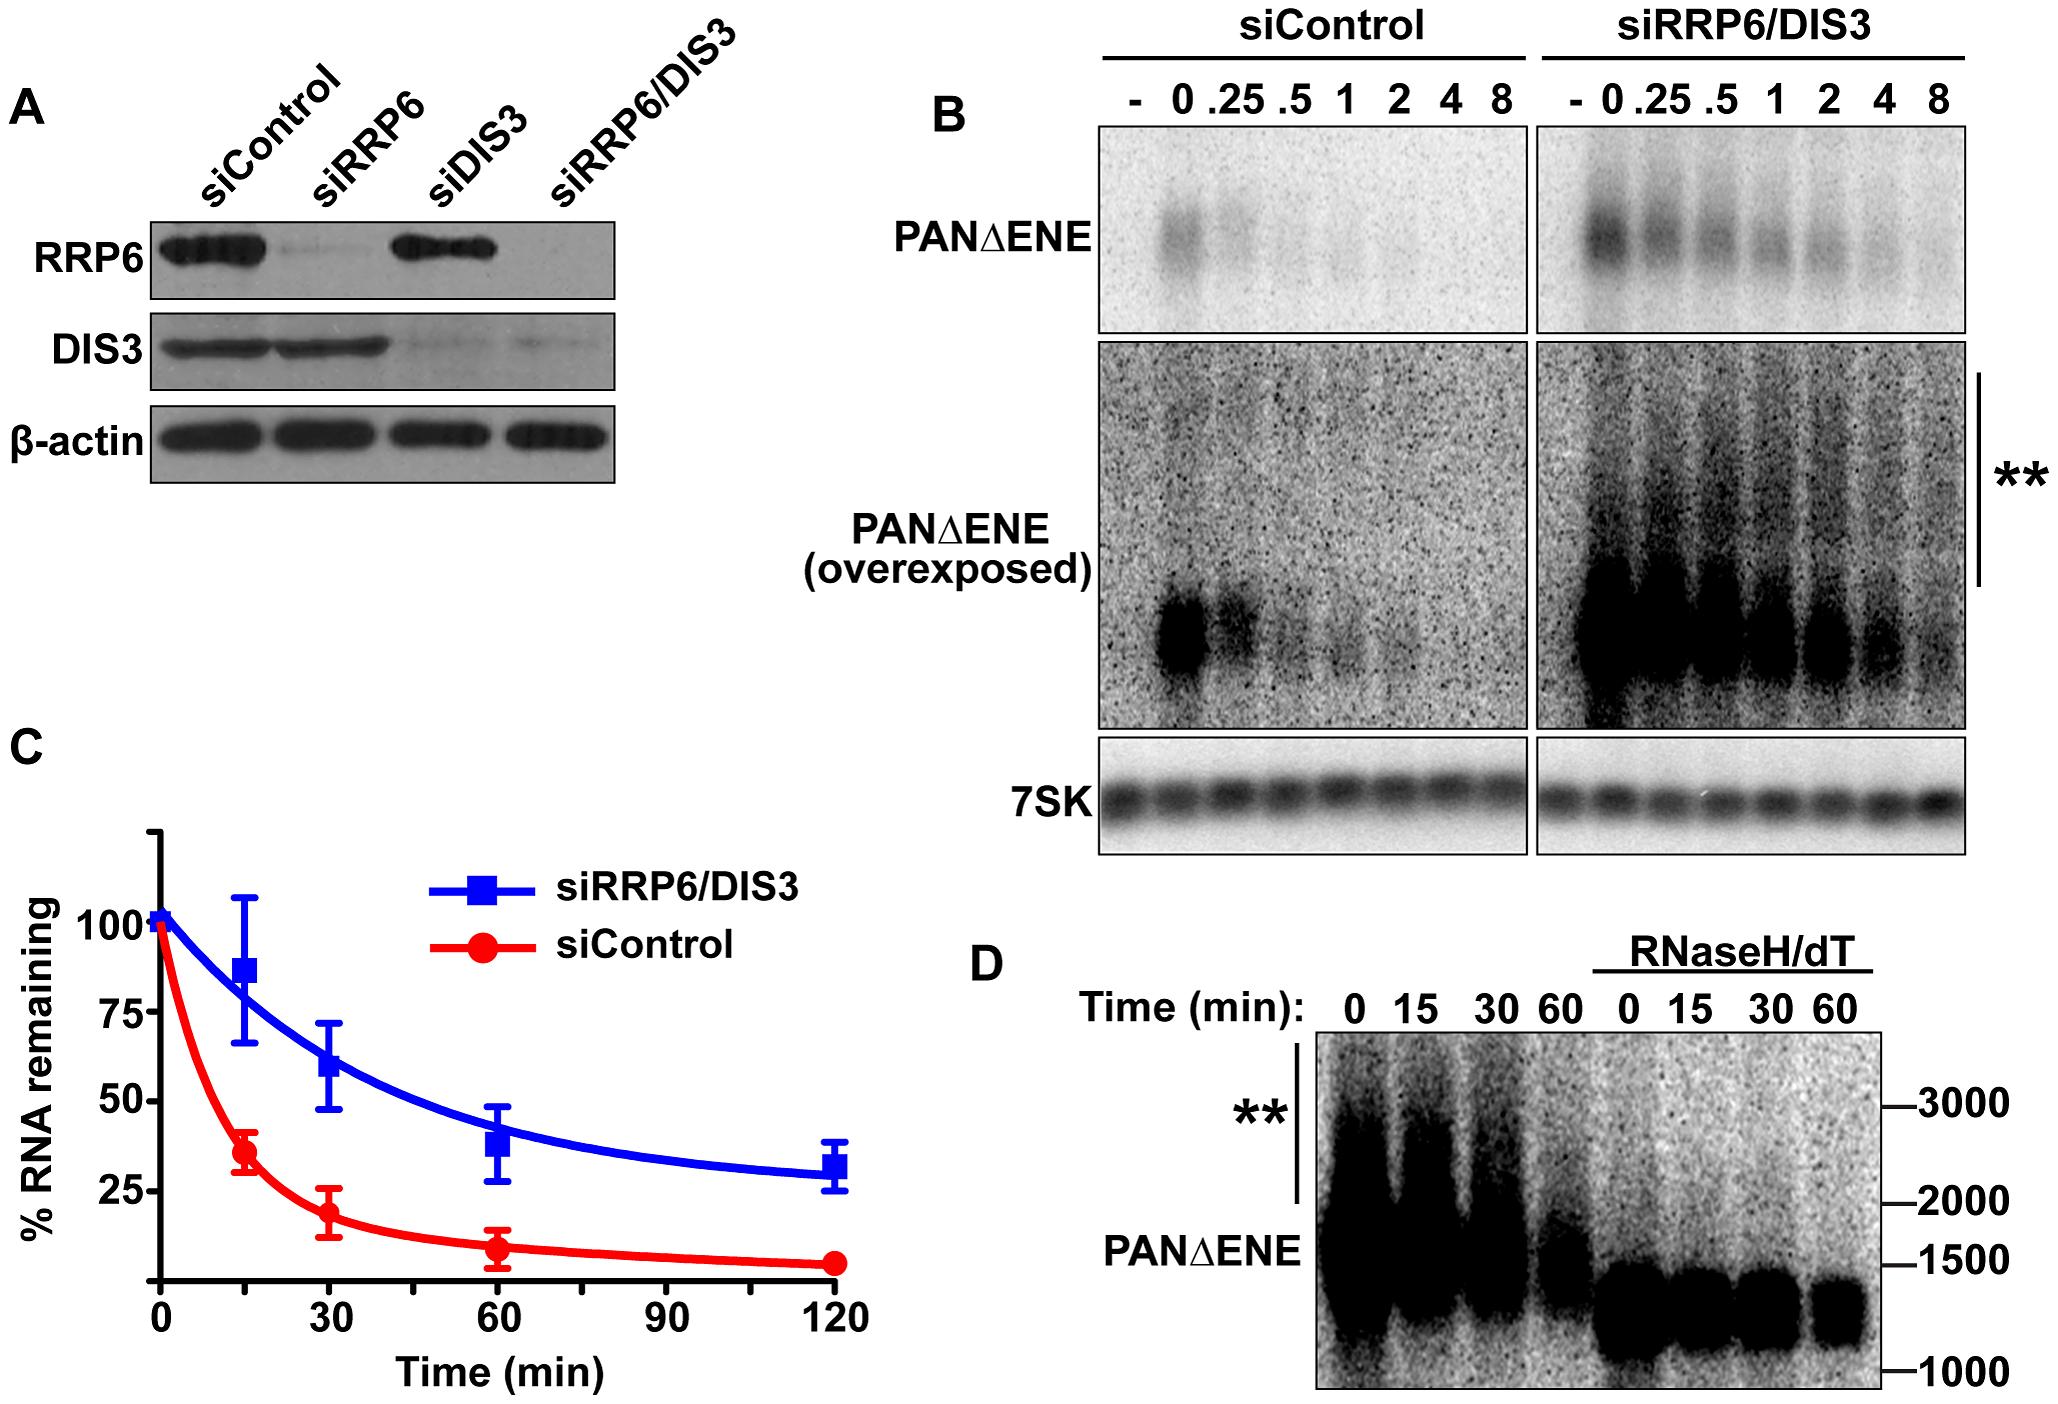 PANΔENE is stabilized and hyperadenylated upon exosome depletion.